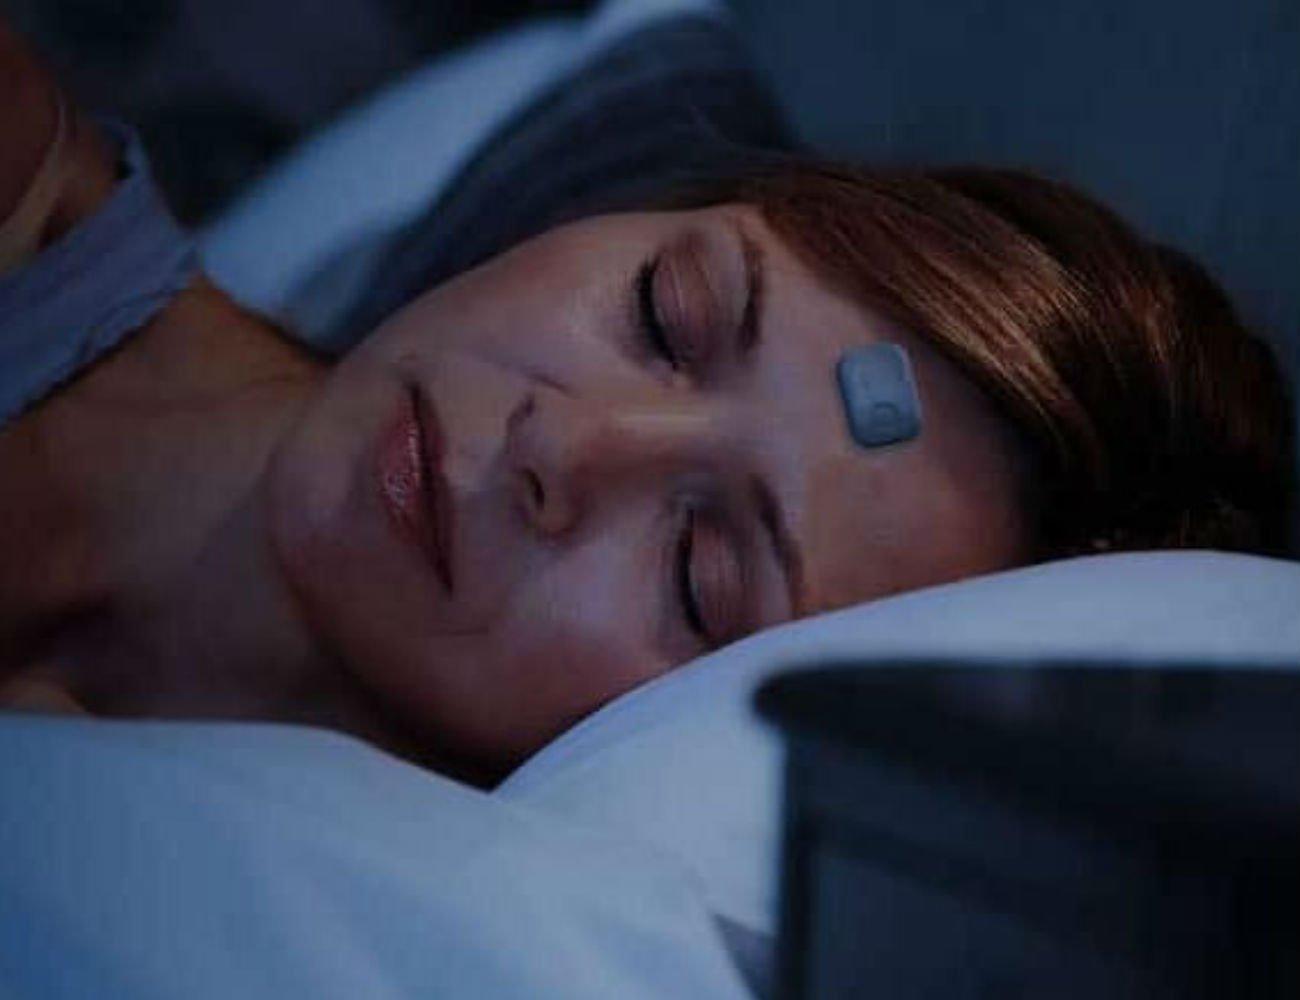 10 Sleep tech gadgets to help you get some shuteye - beddr 0